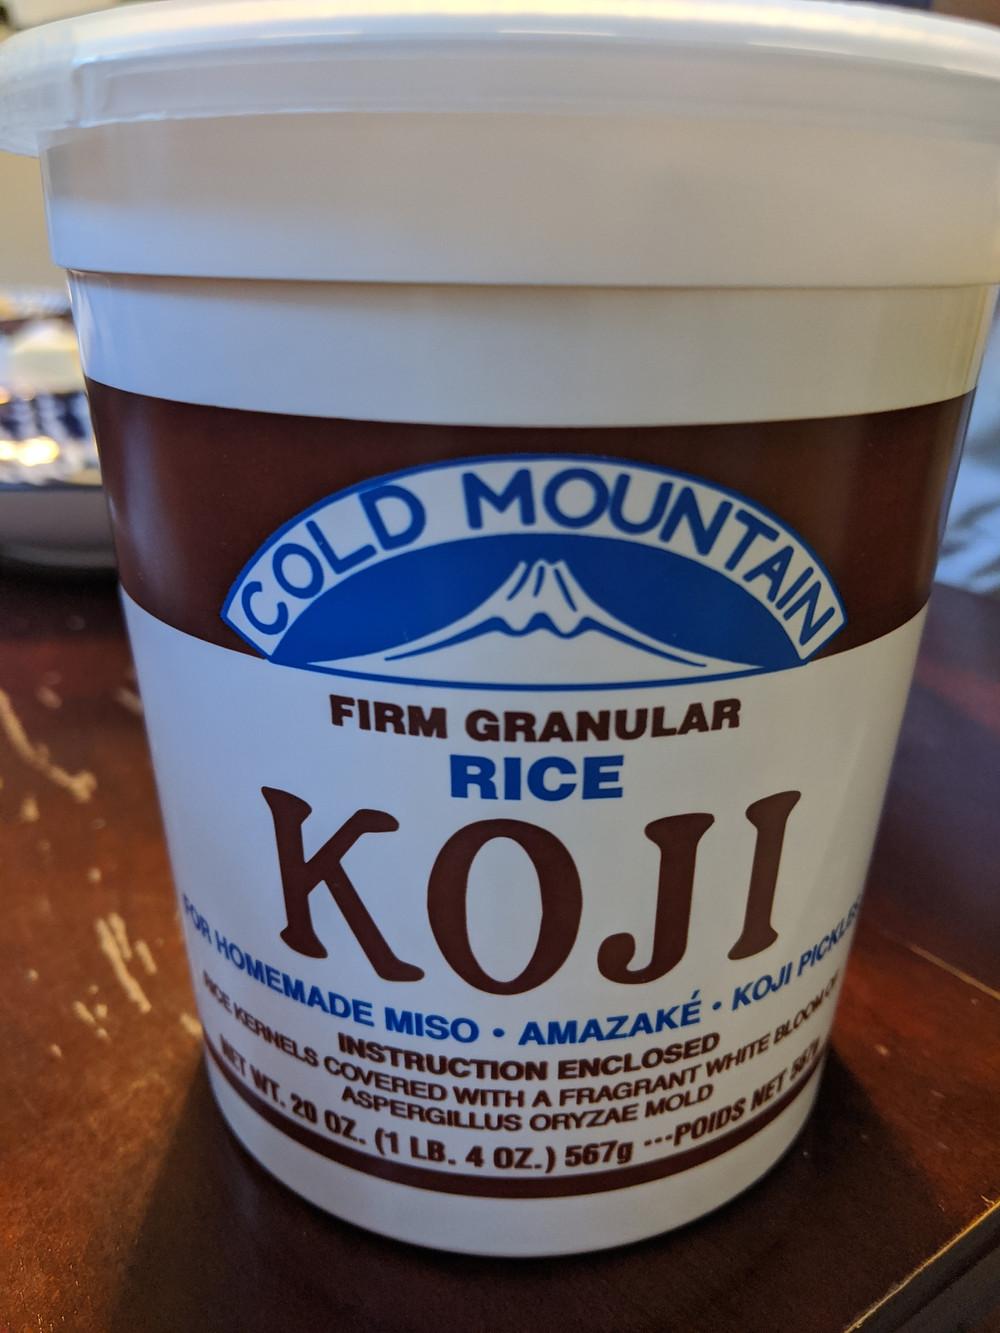 Cold Mountain Rice Koji